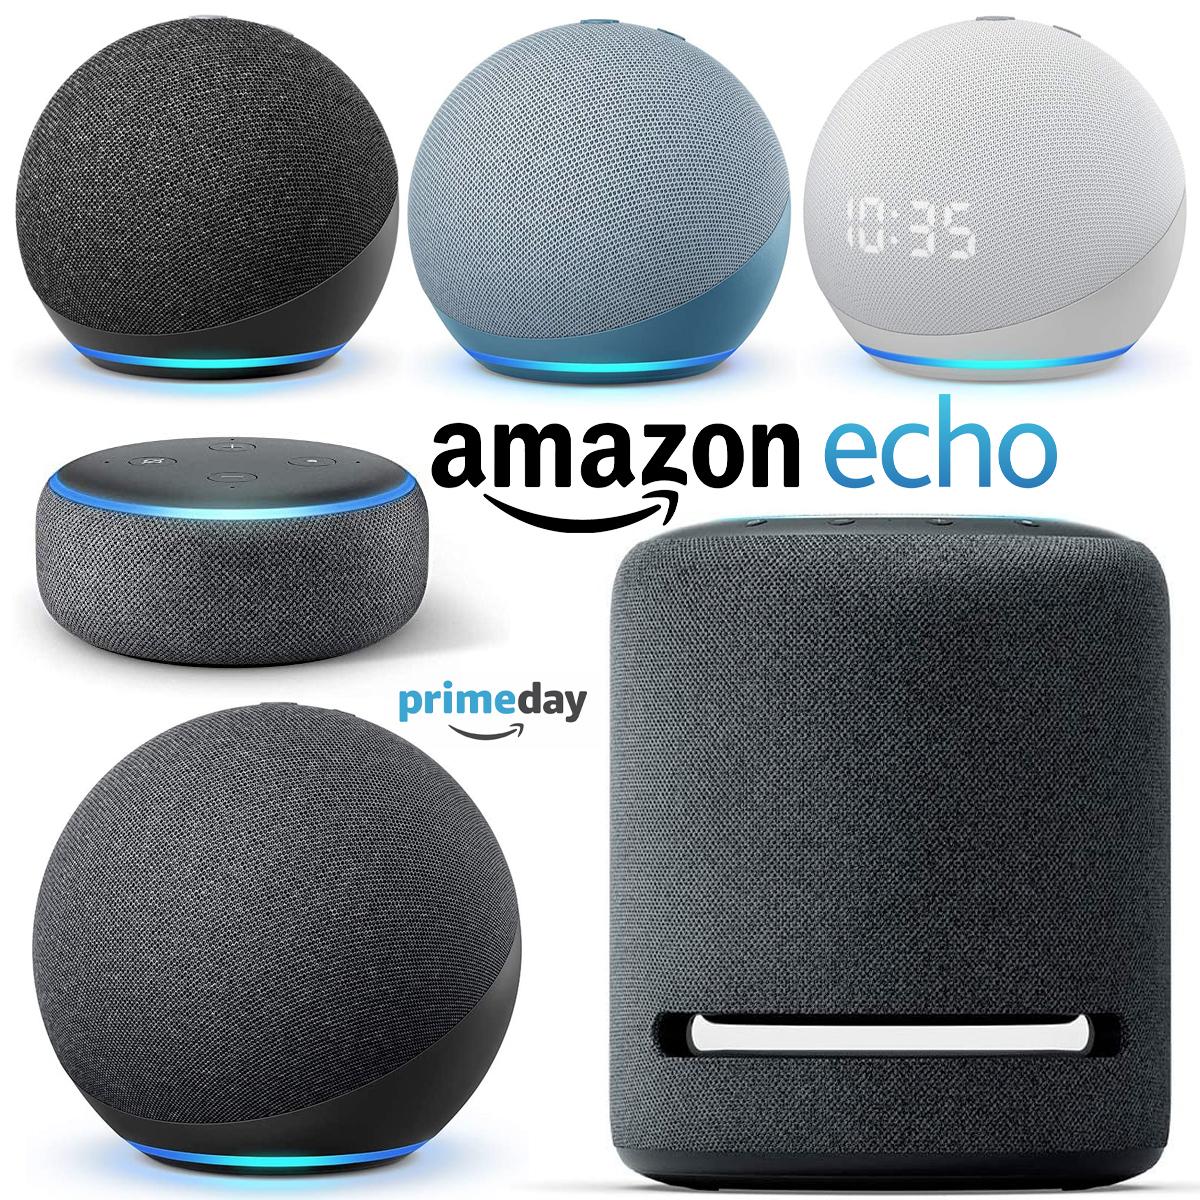 Amazon Echo no Prime Day